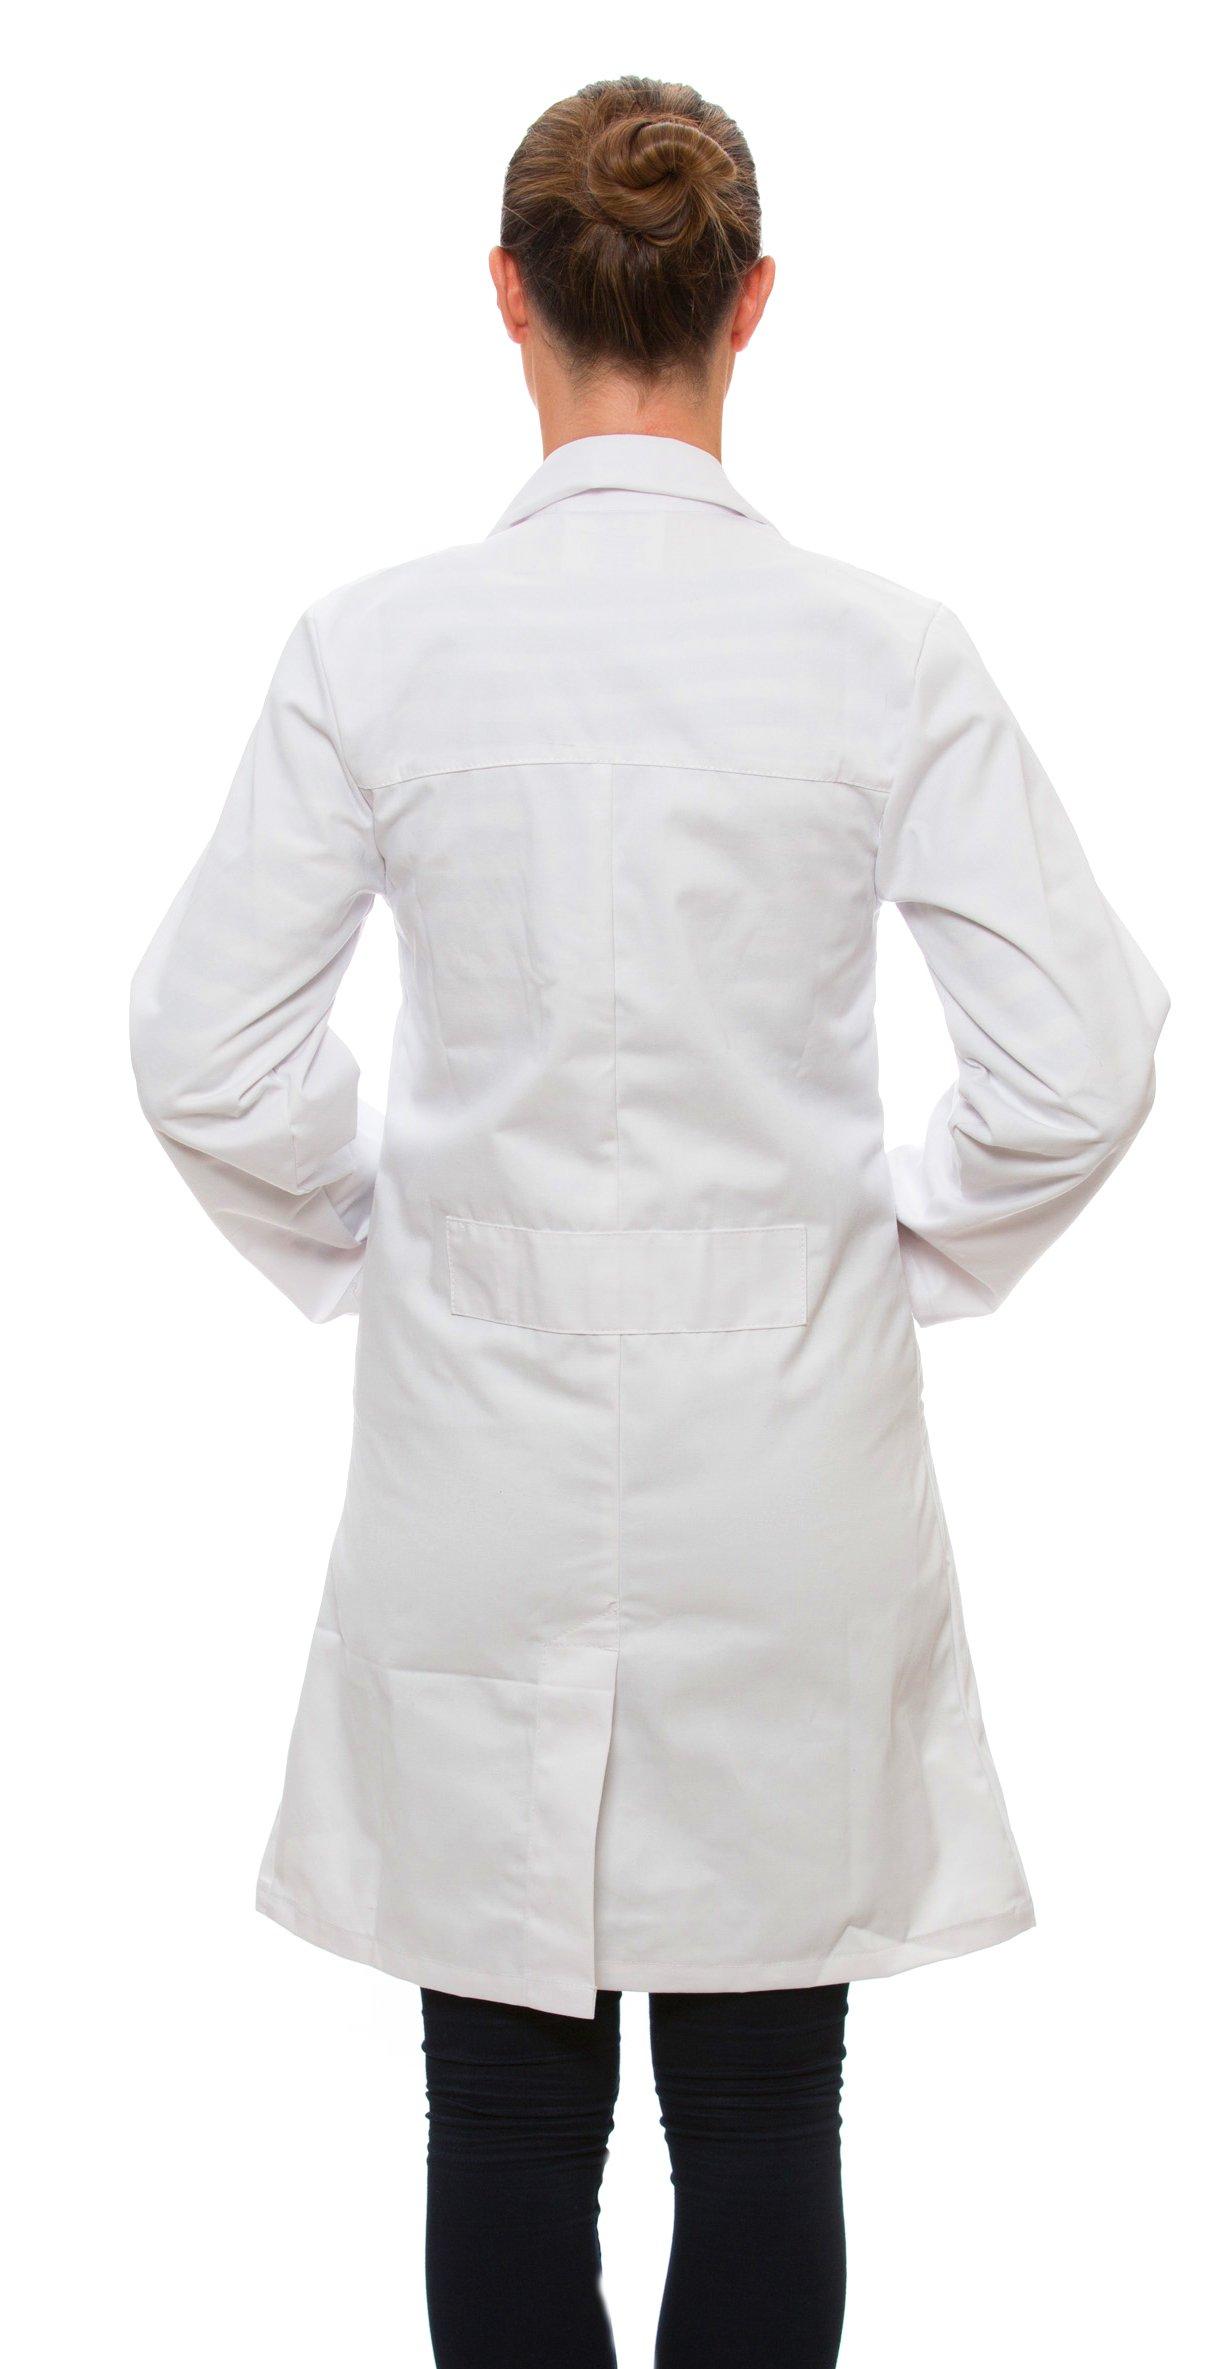 Dr. James Women's 100% Cotton White Lab Coat 39 Inch Length Size 6 US-04-C by Dr. James (Image #3)